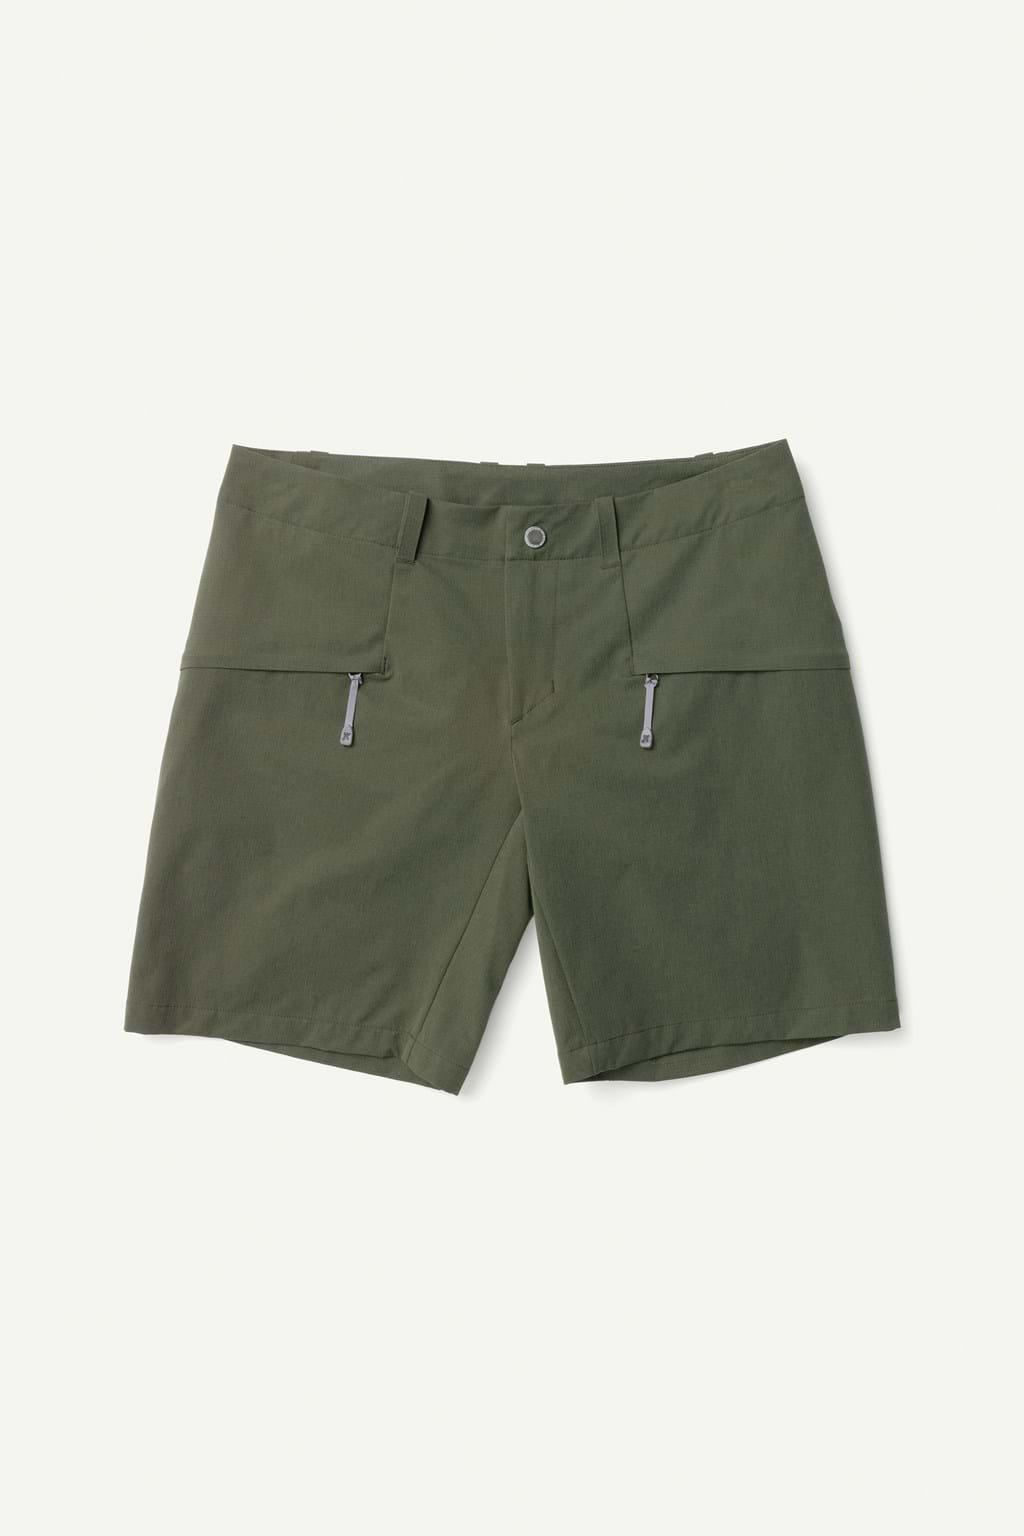 HOUDINI W's Daybreak Shorts